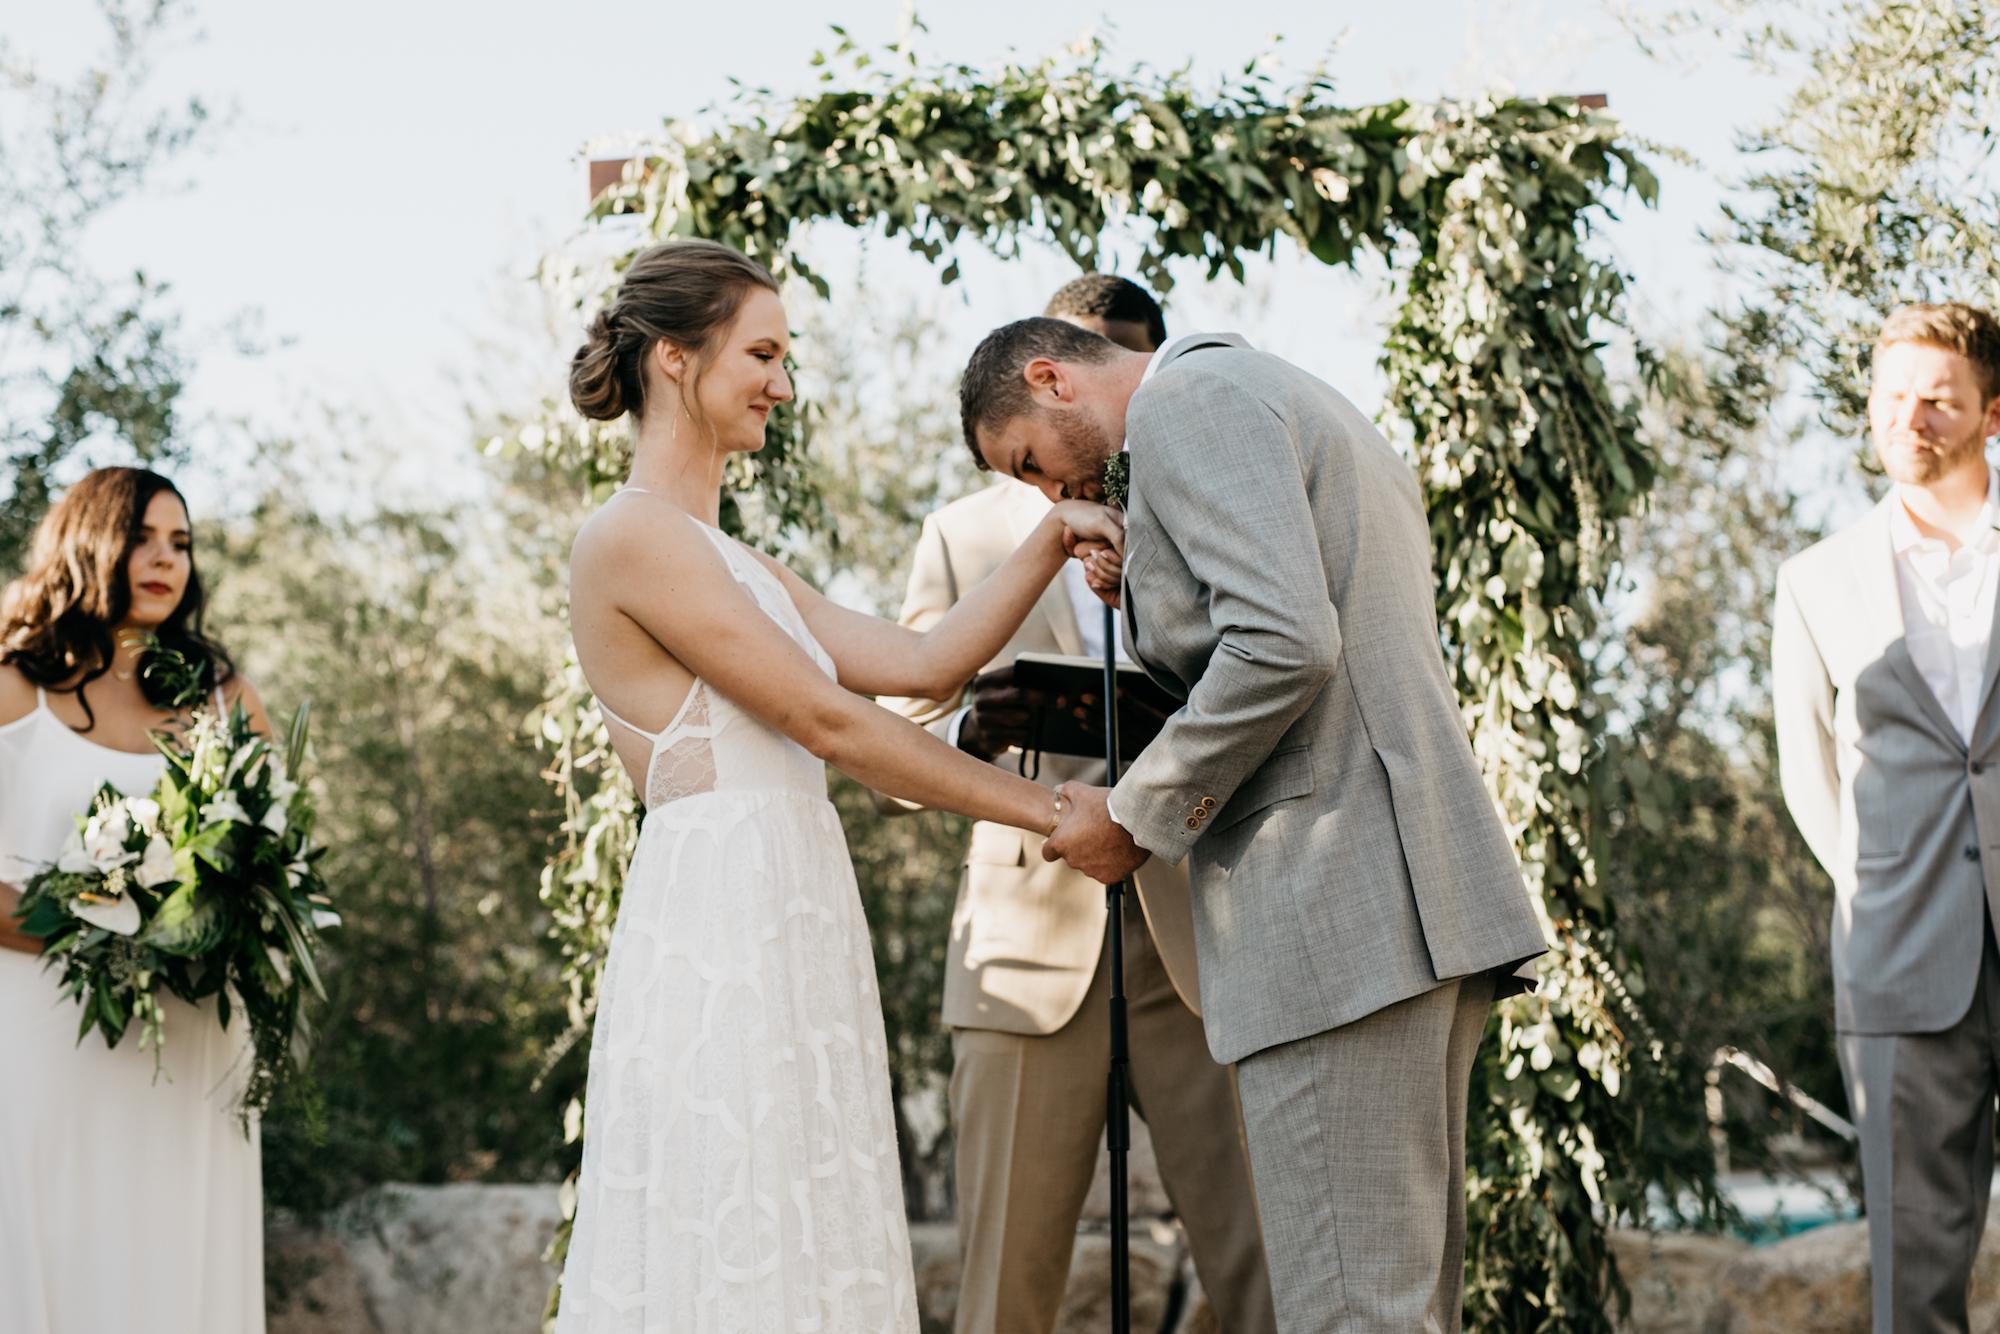 ace-hotel-palm-springs-wedding-photographer570.jpg